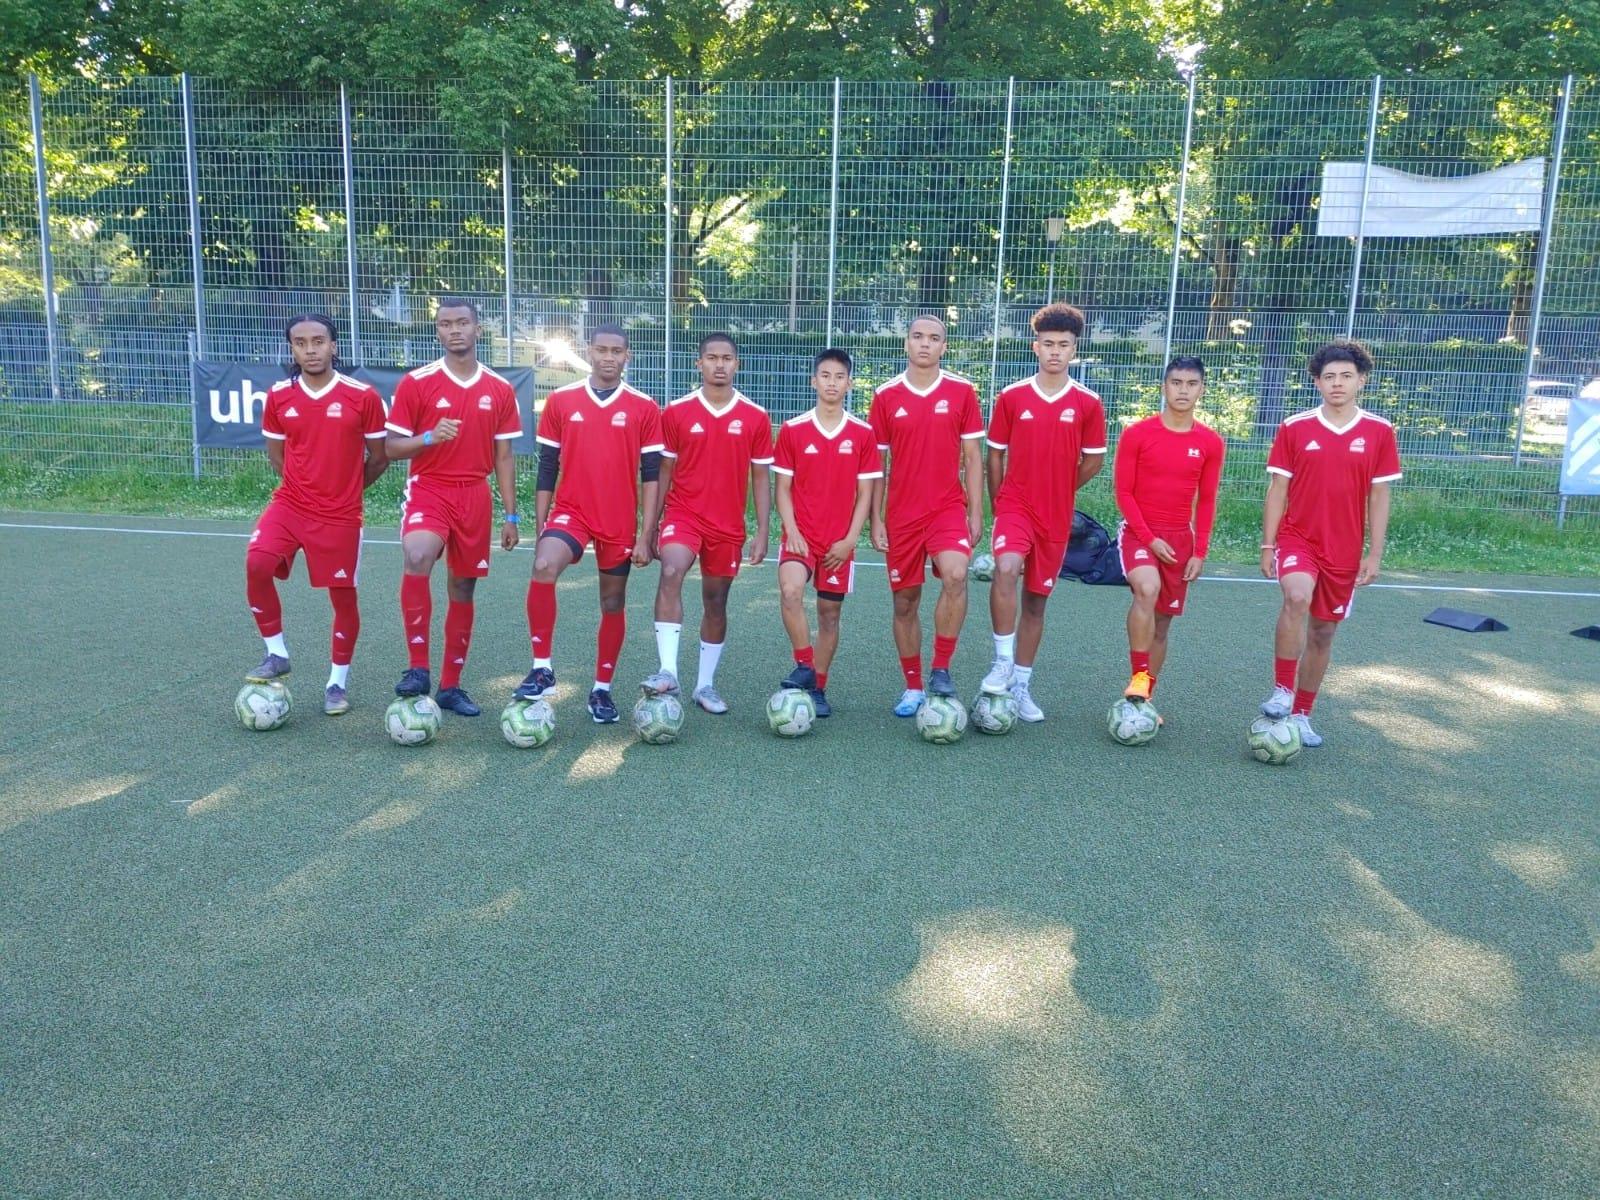 Munich Football School Munich Germany - 4